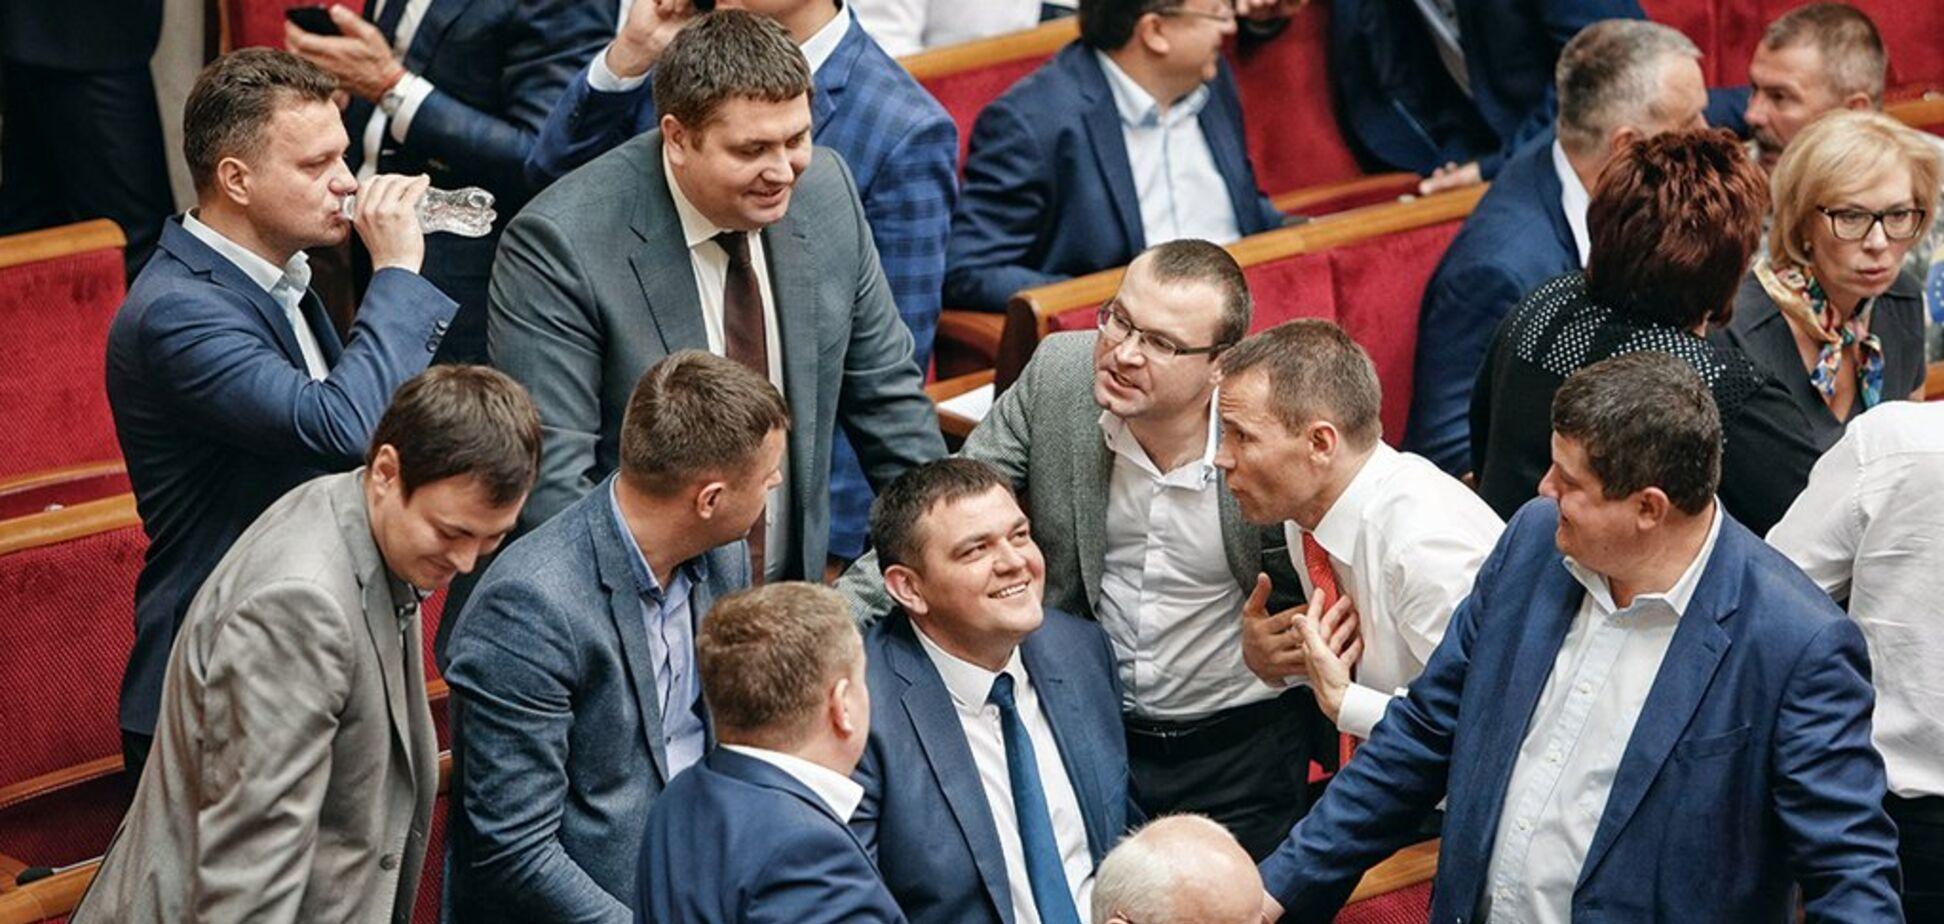 Богдан назвав нардепів психами: генерал закликав втрутитися СБУ